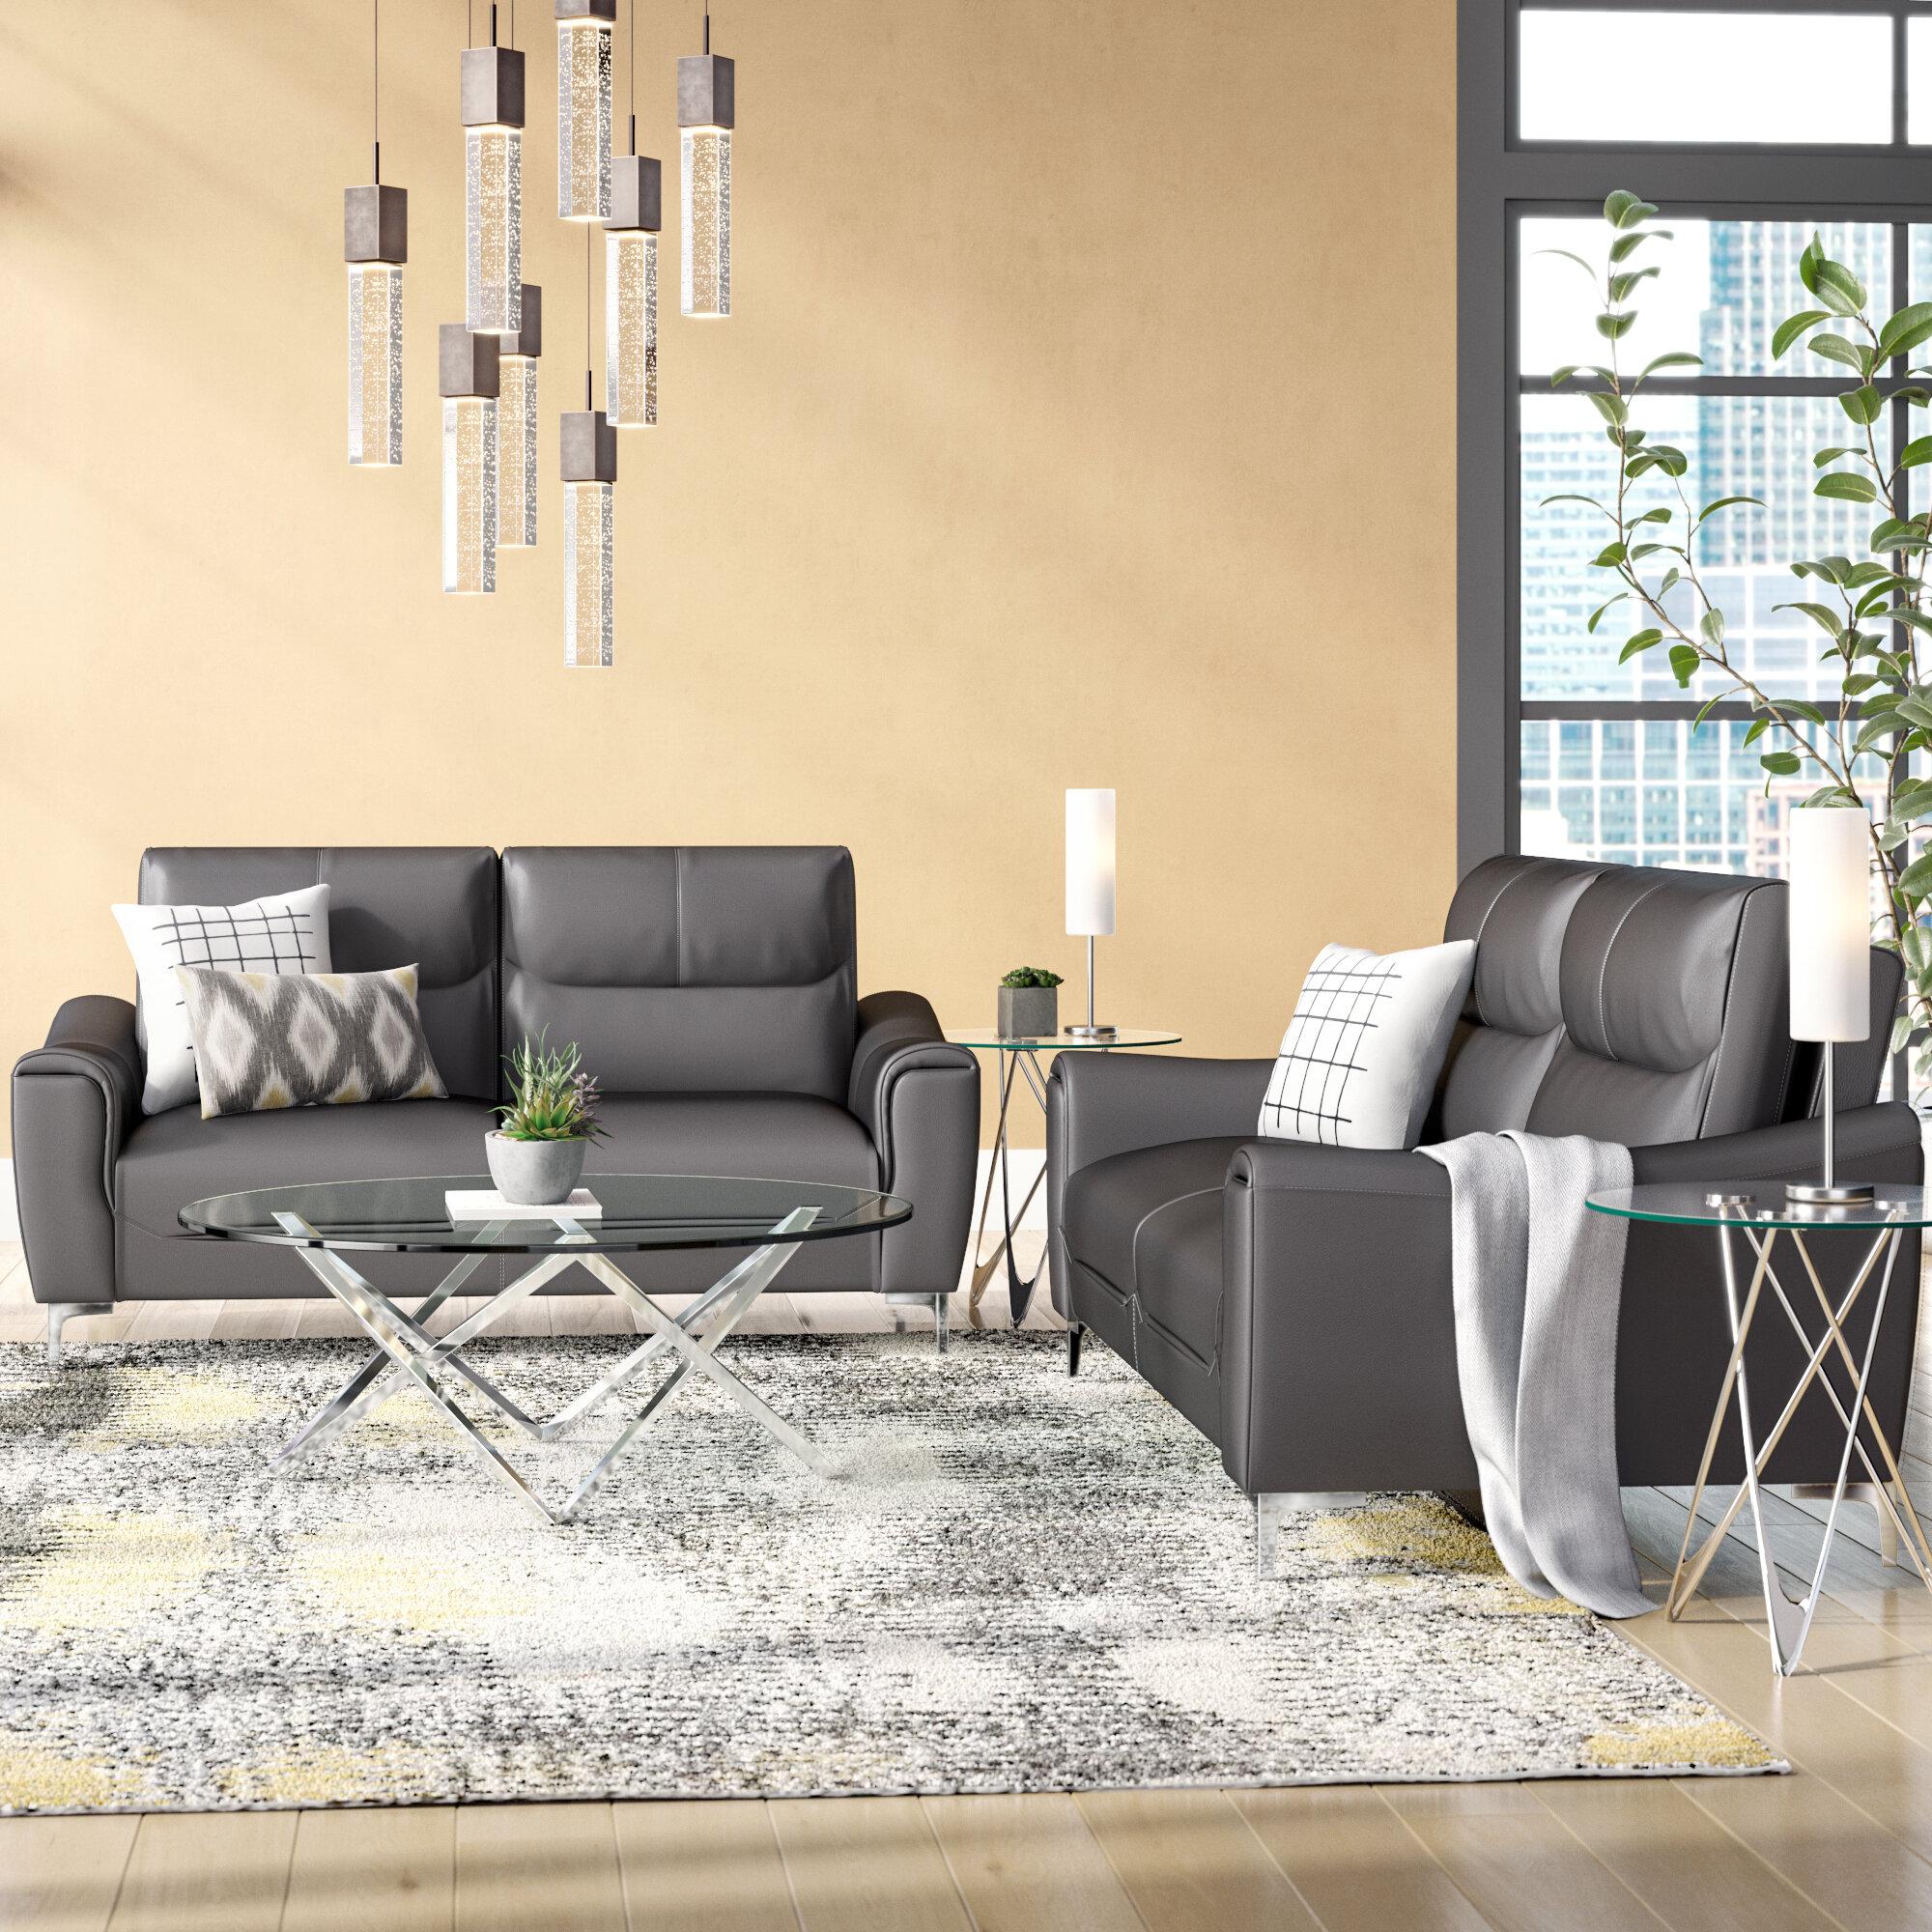 Peachy Malissa 2 Piece Living Room Set Andrewgaddart Wooden Chair Designs For Living Room Andrewgaddartcom